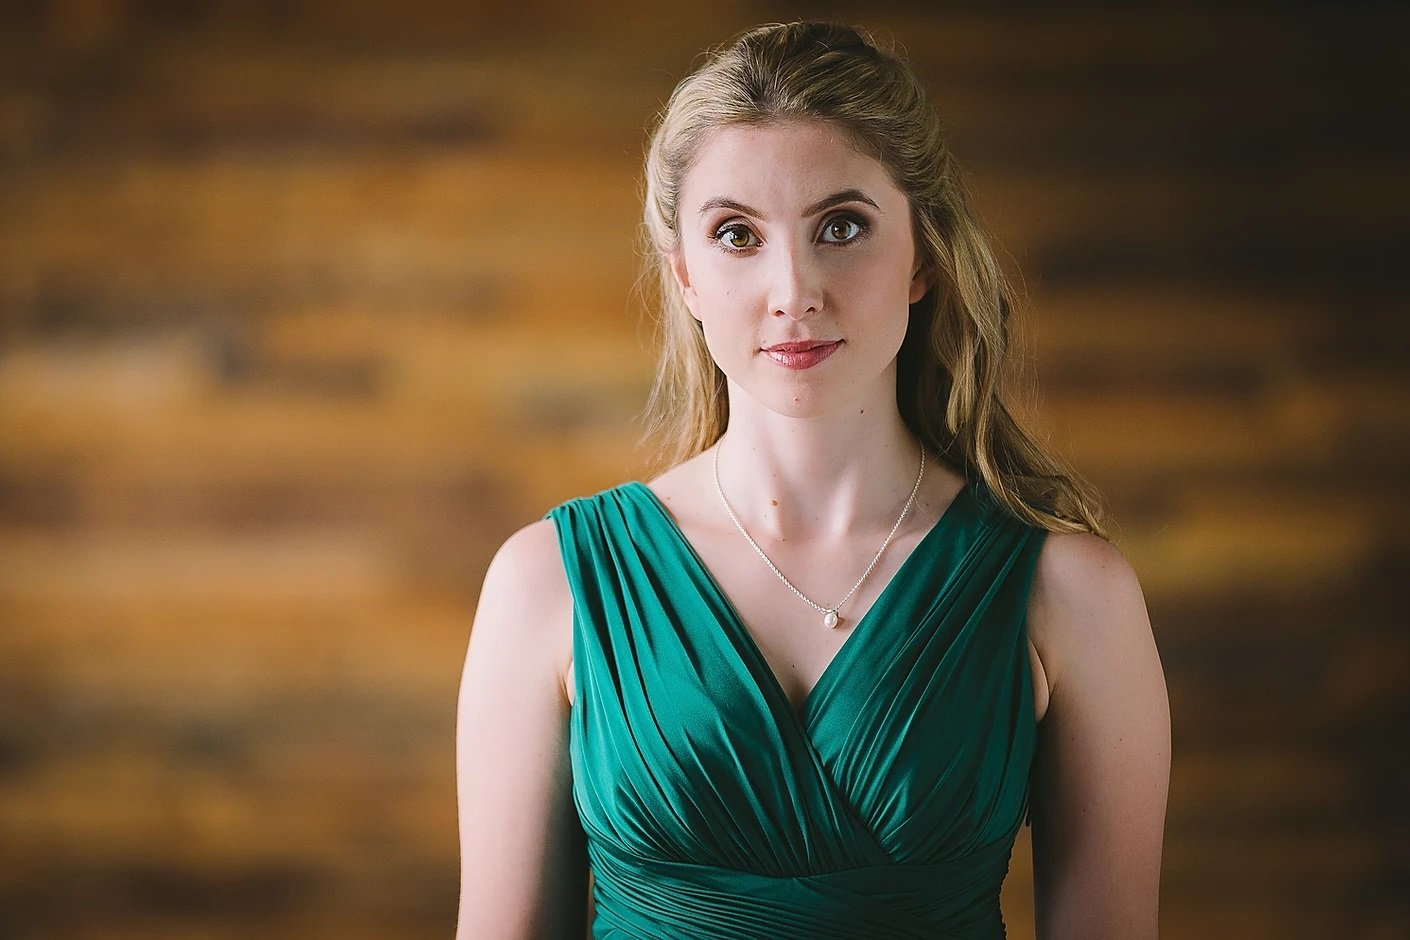 Lara Rebekah Harvey © Tom Gradwell photography